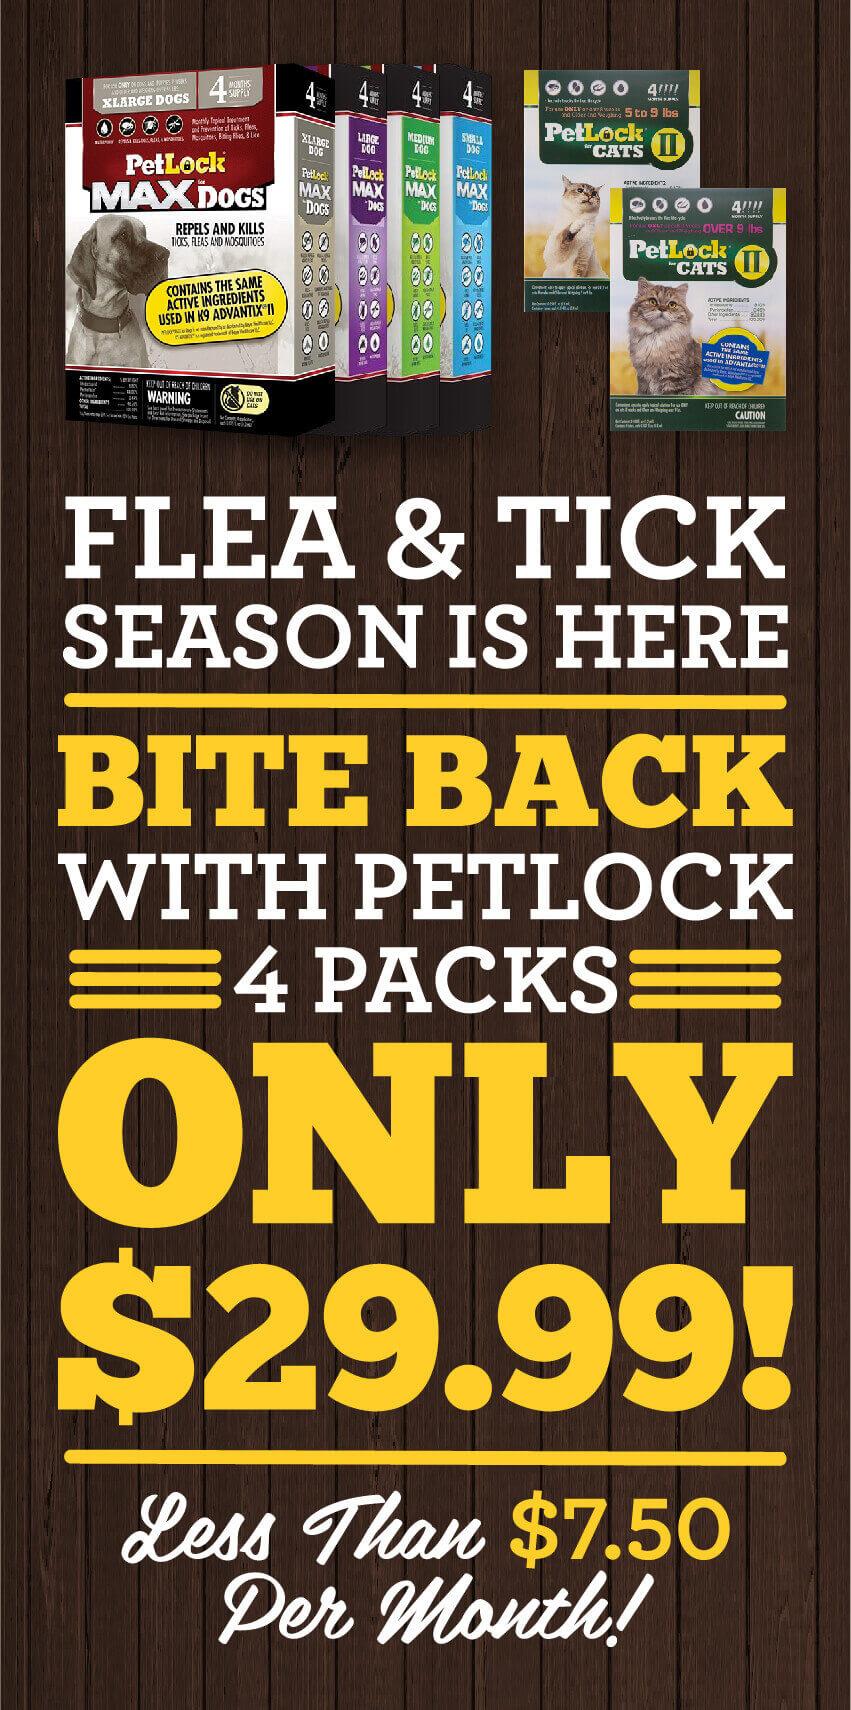 Flea and tick season is here - Only twenty-nine dollars and nintey-nine cents!